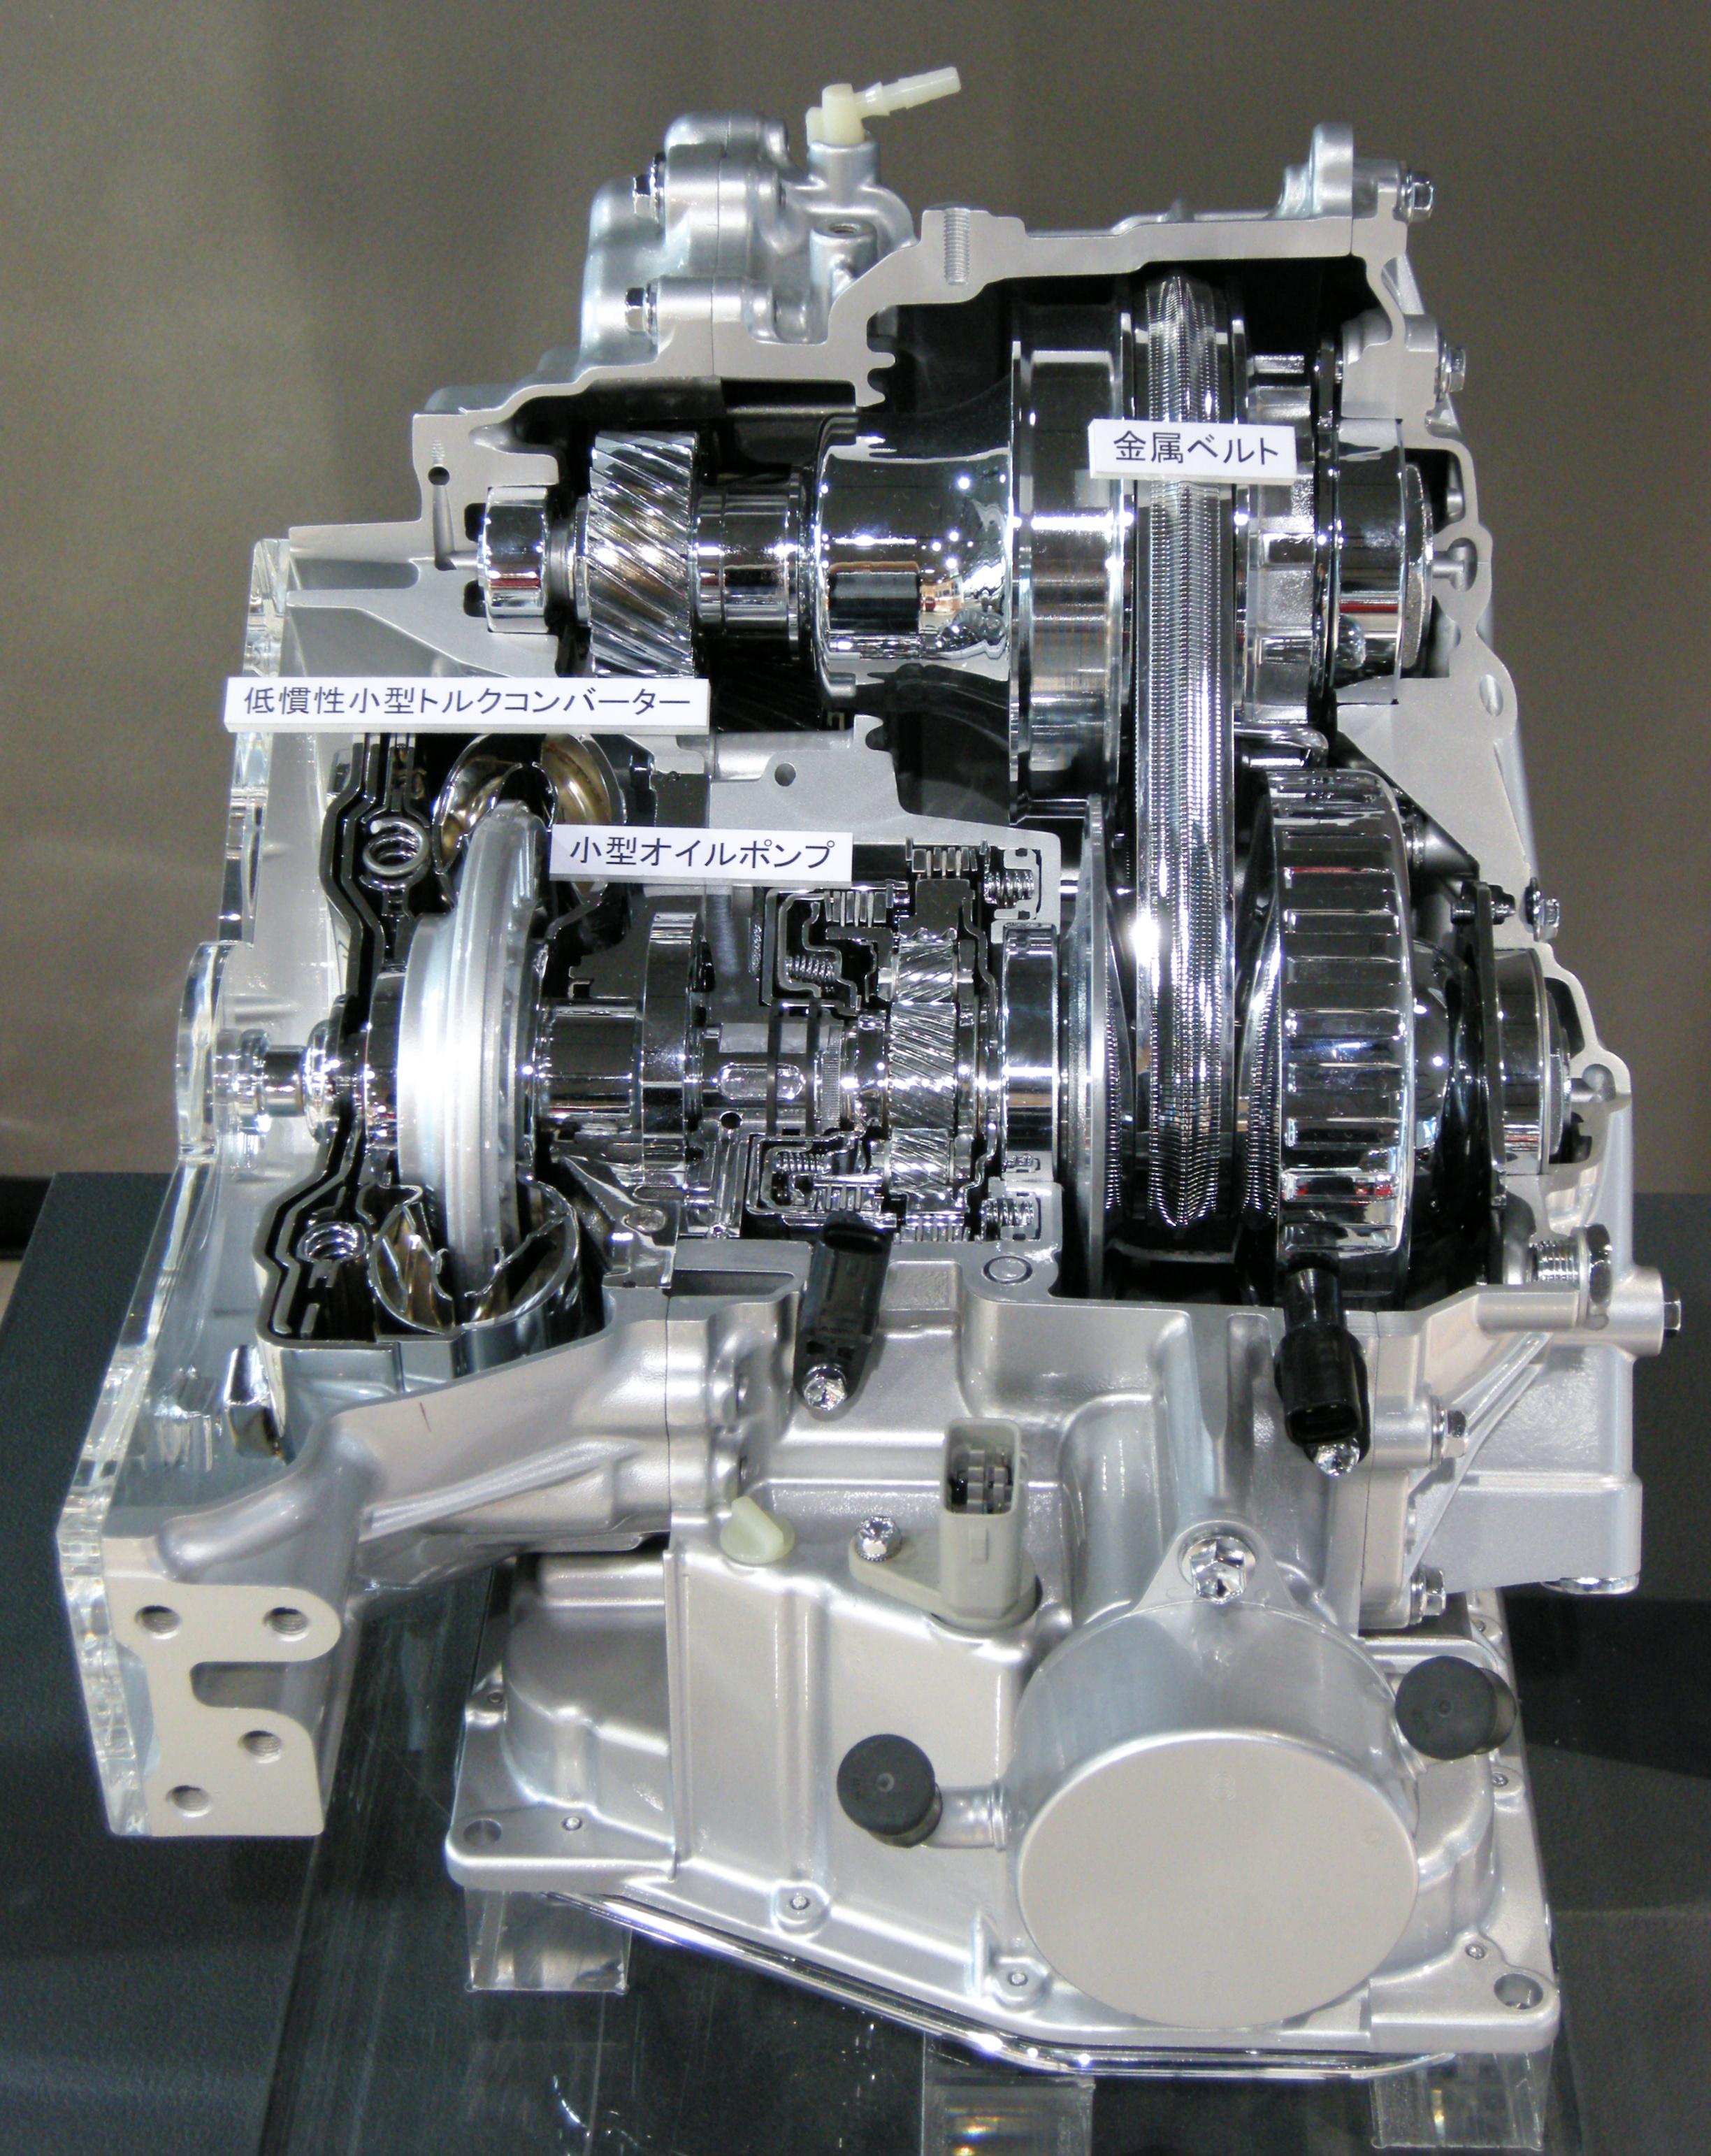 Saturn Automatic Transmission Problems